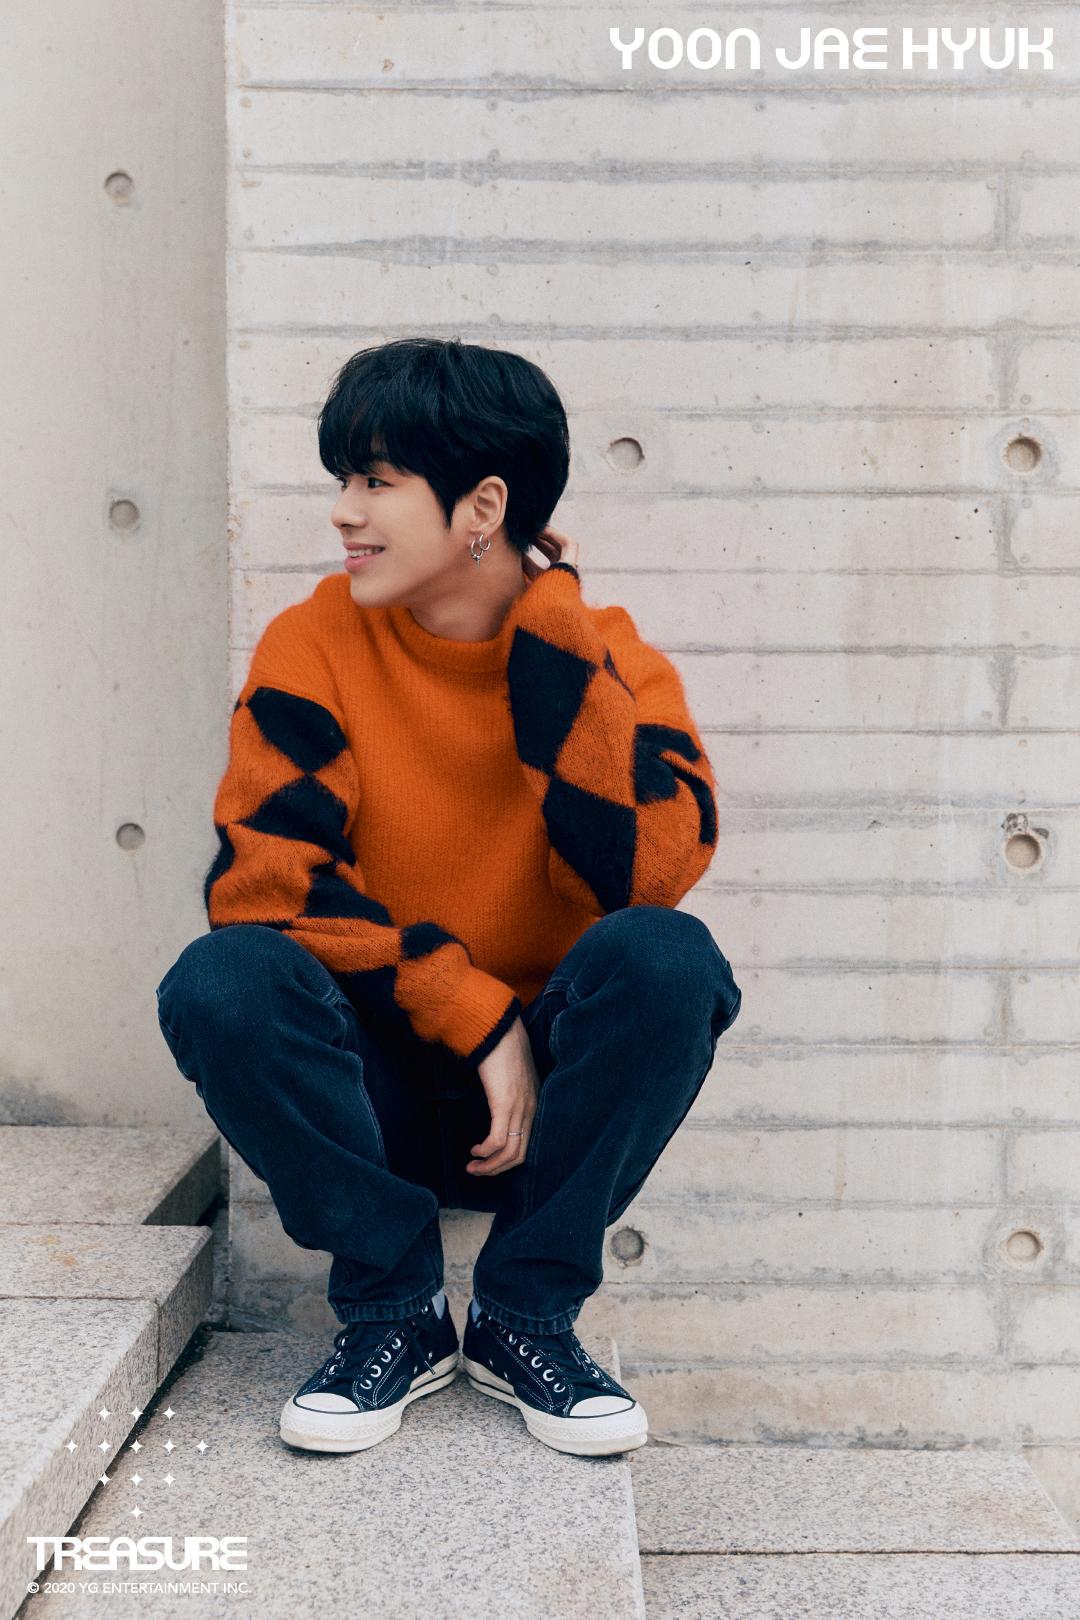 Treasure Yoon Jaehyuk